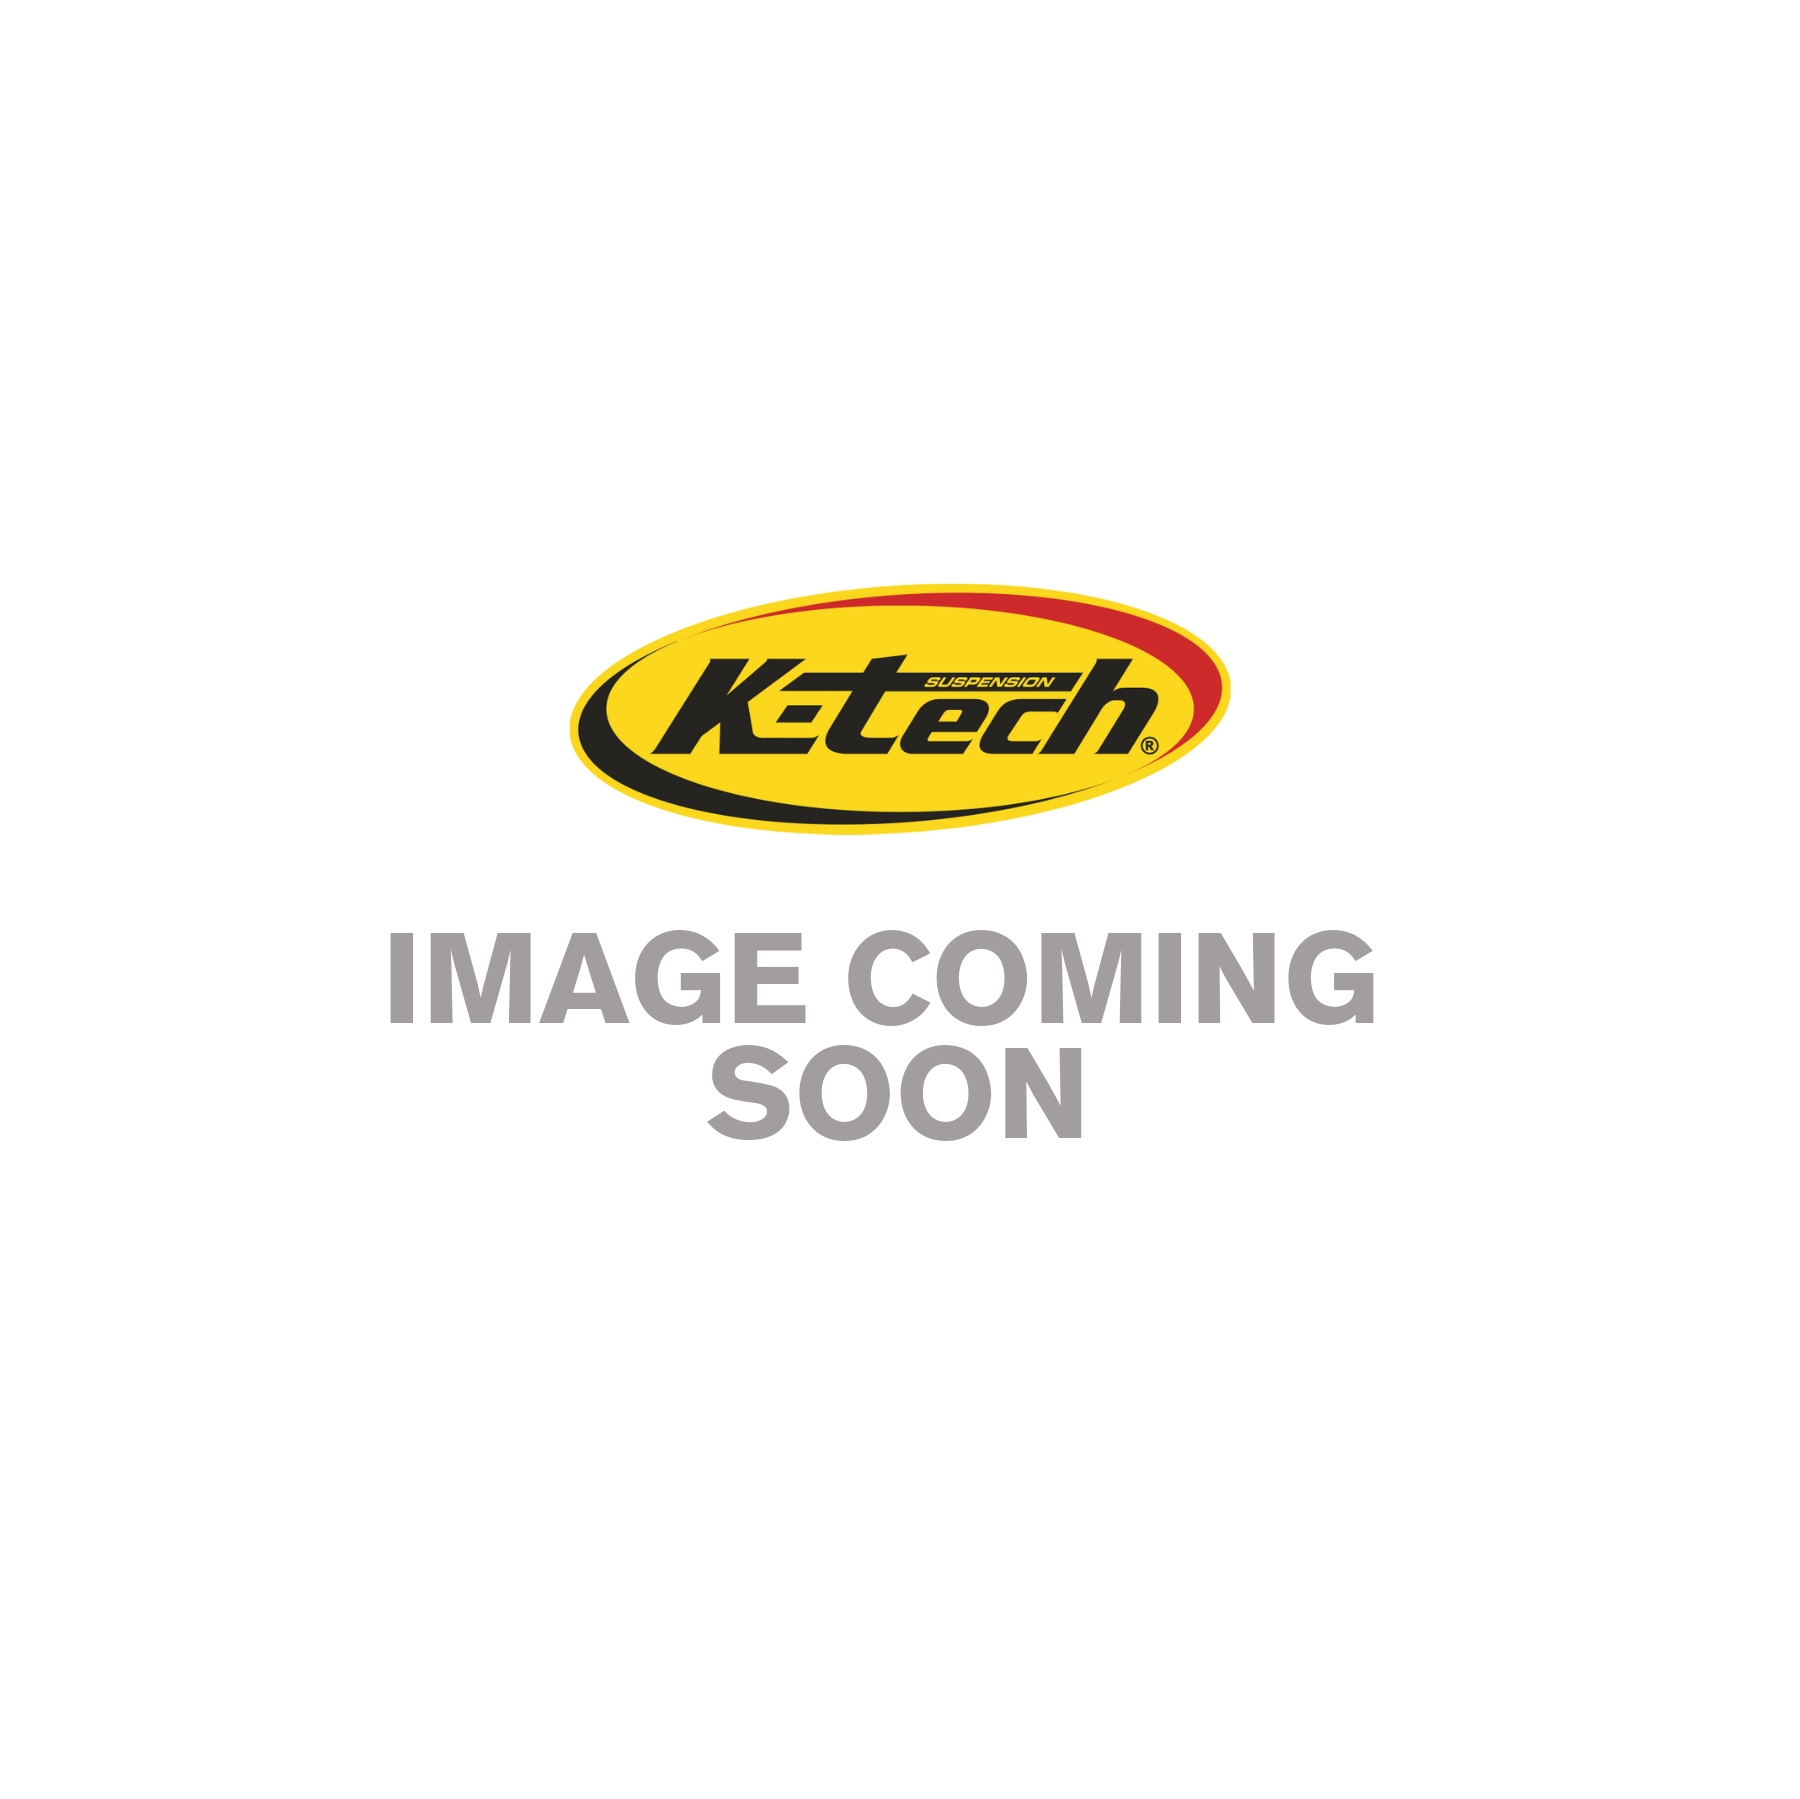 20IDS Front Fork Cartridges Yamaha FZ/MT-09 XSR900 2013> KYB